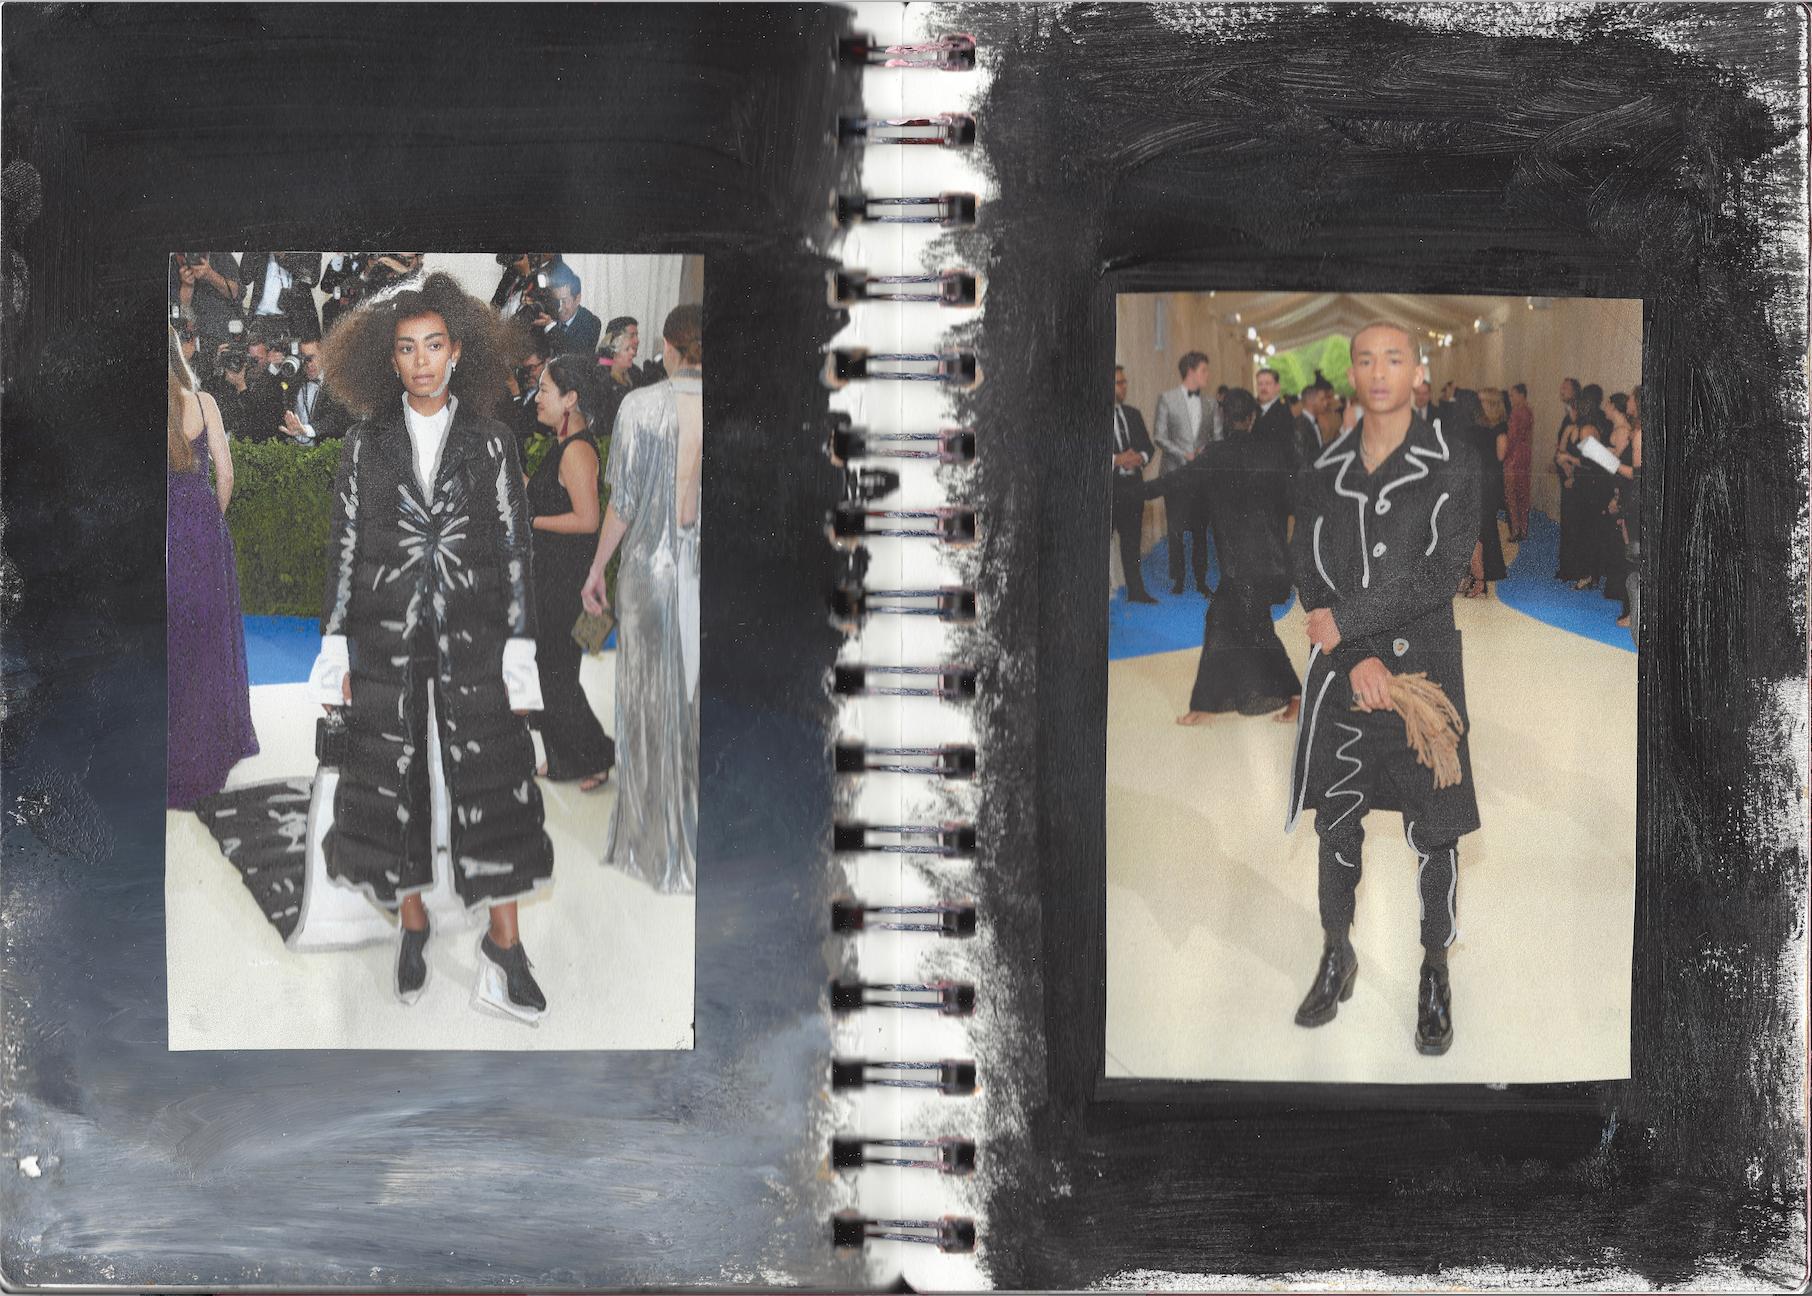 Solange wears Thom Browne, Jaden Smith wears Louis Vuitton